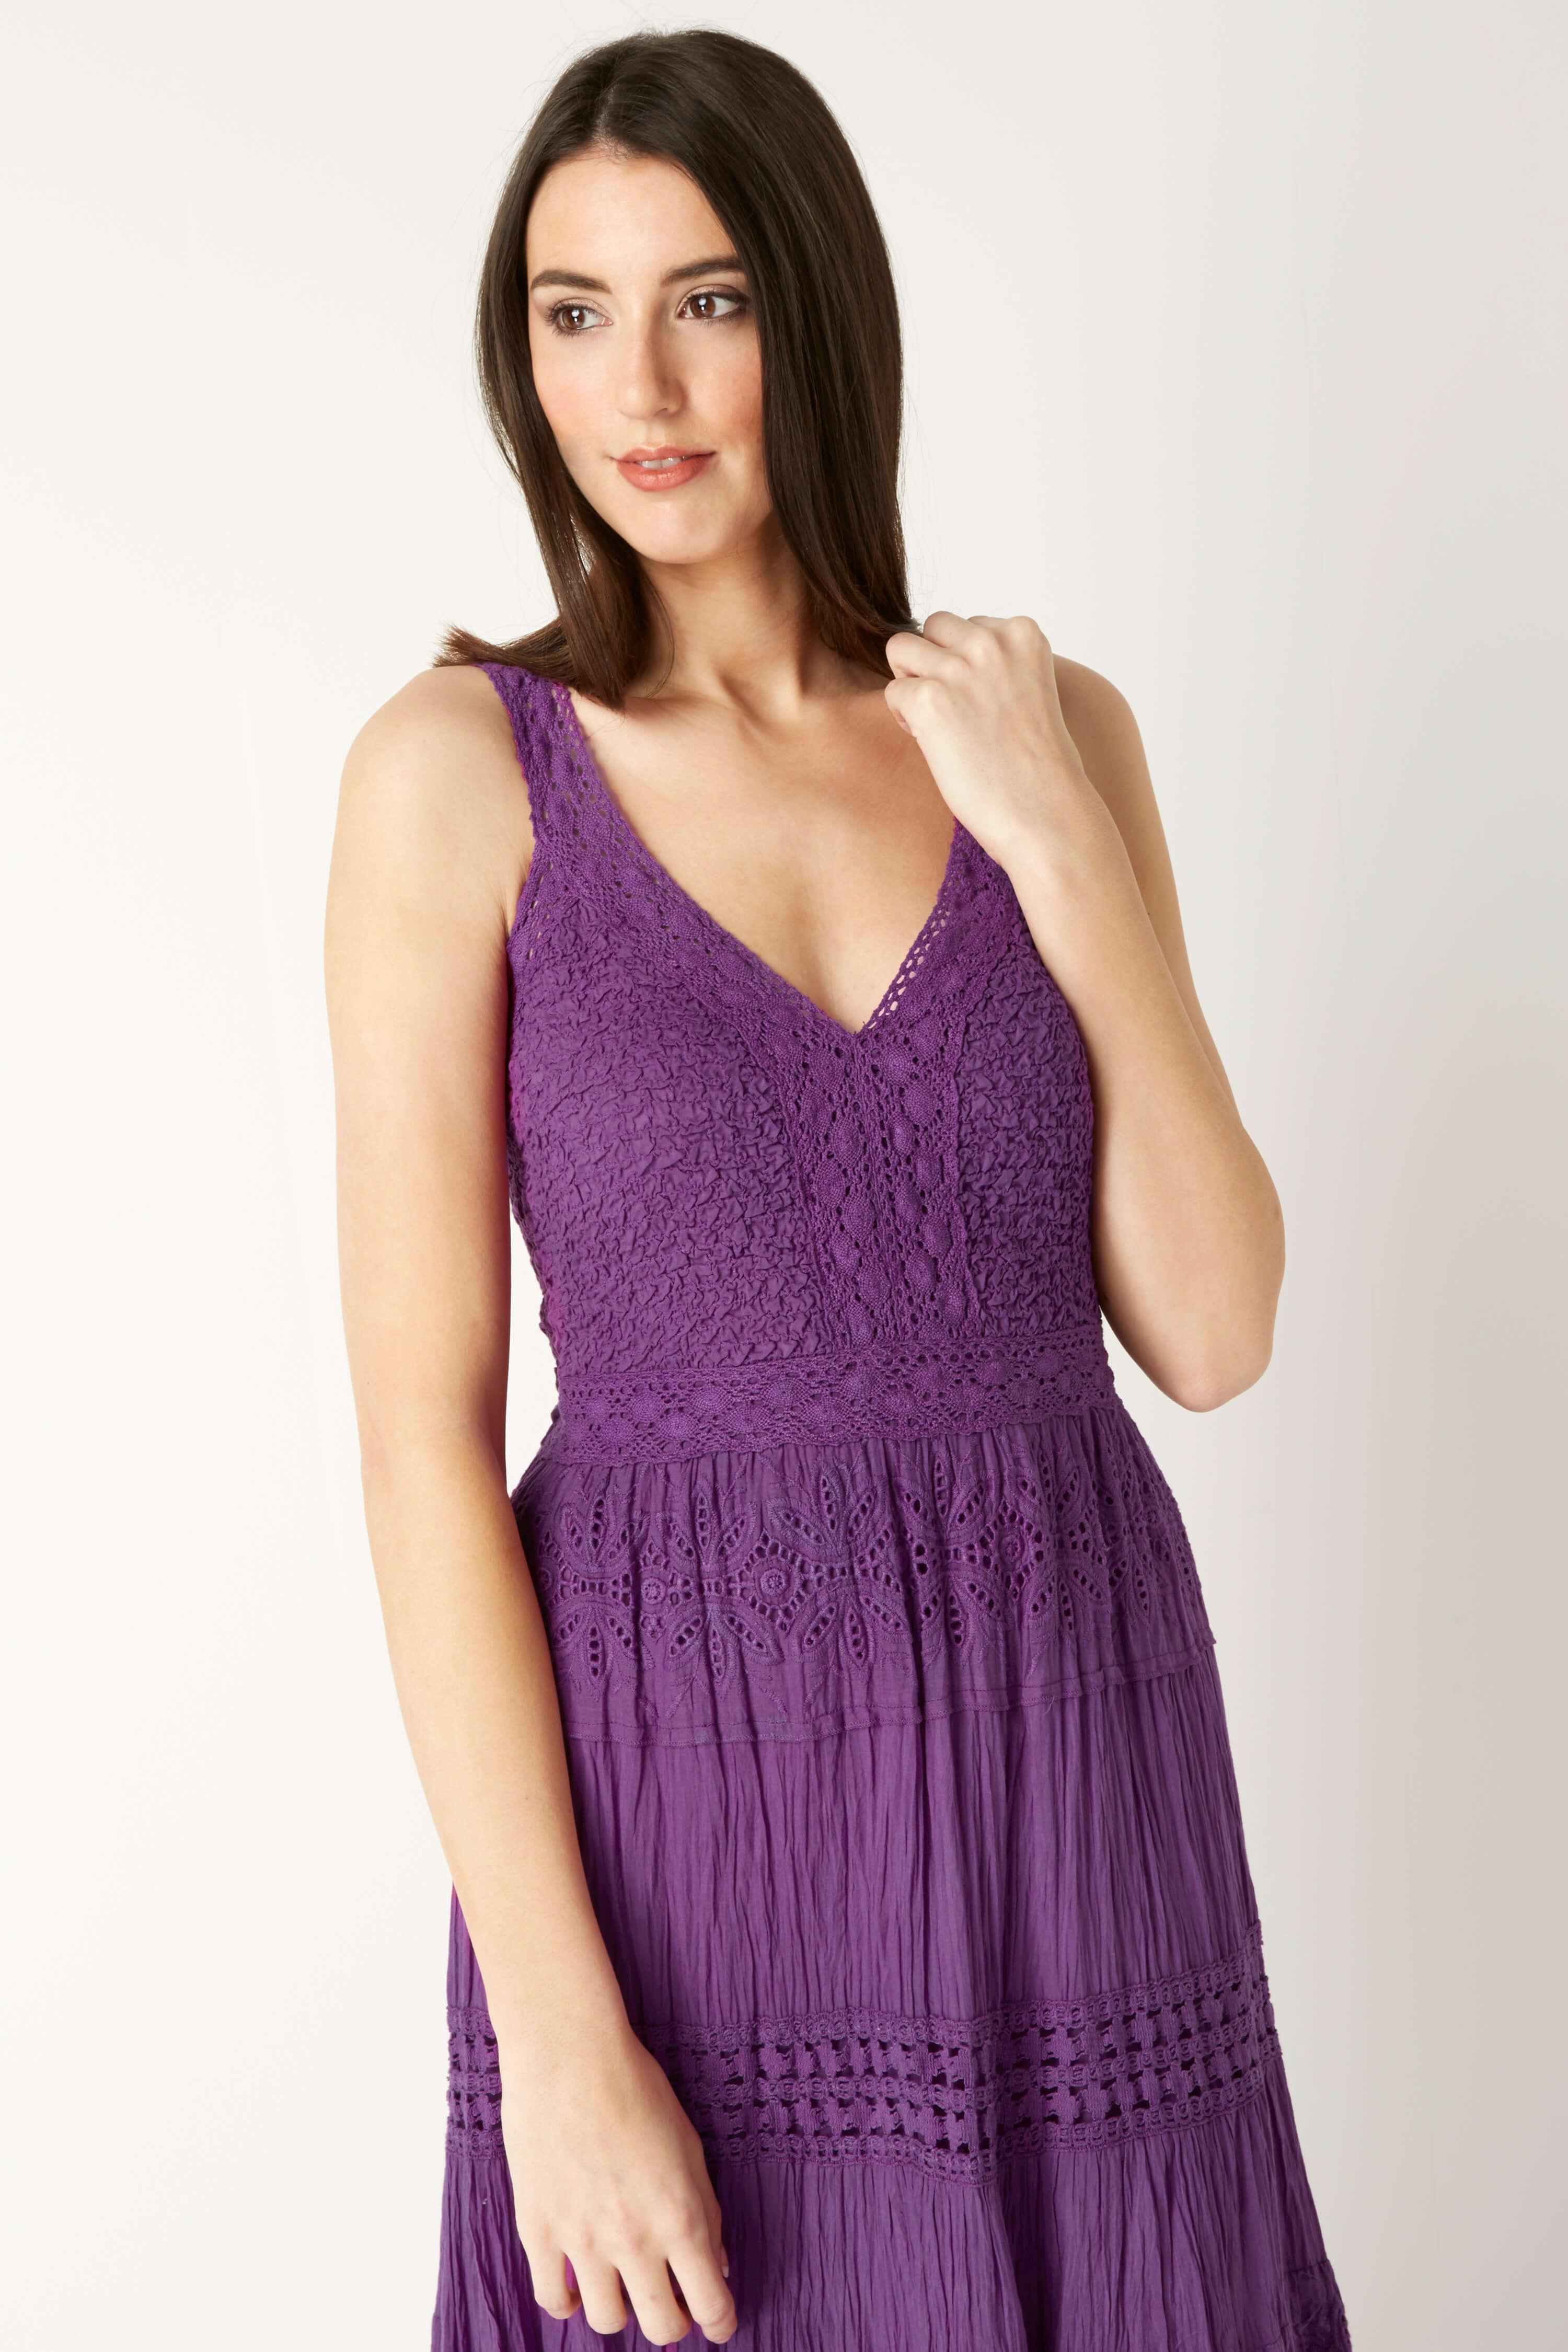 Roman Originals 100% Cotton Summer Maxi Dress in Purple